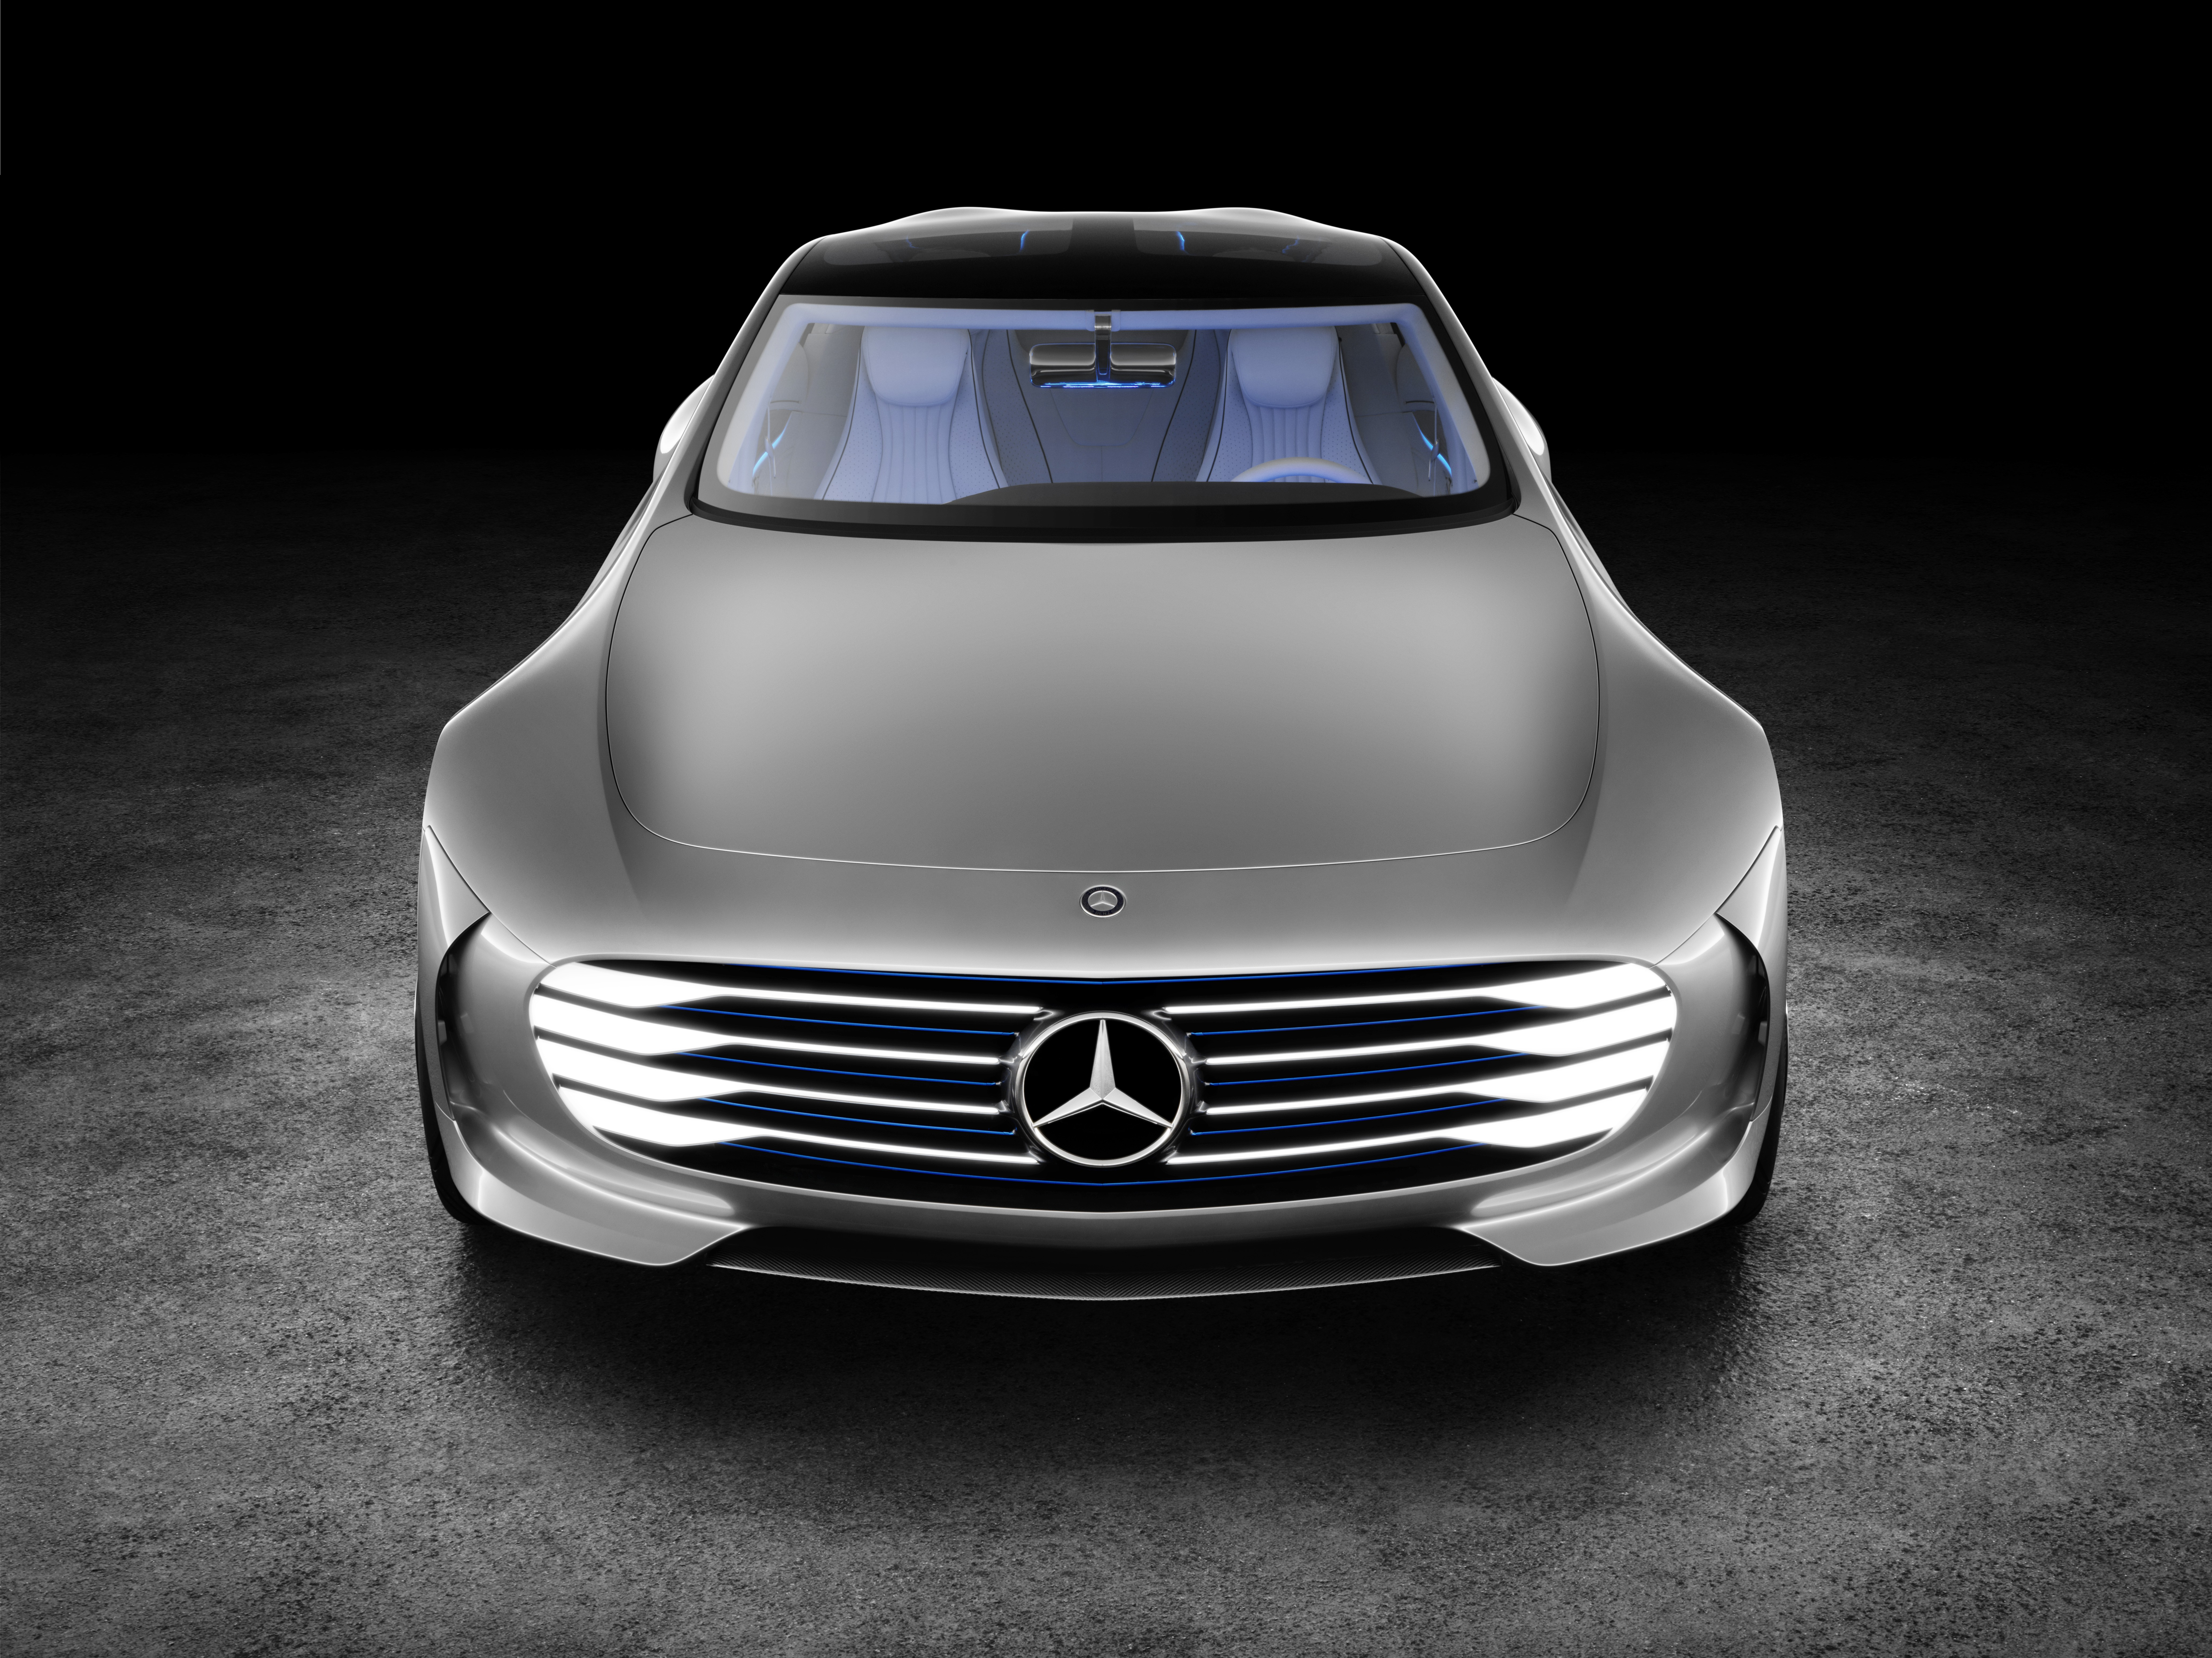 2019 Mercedes Benz Cls May Not Be A Mercedes Benz After